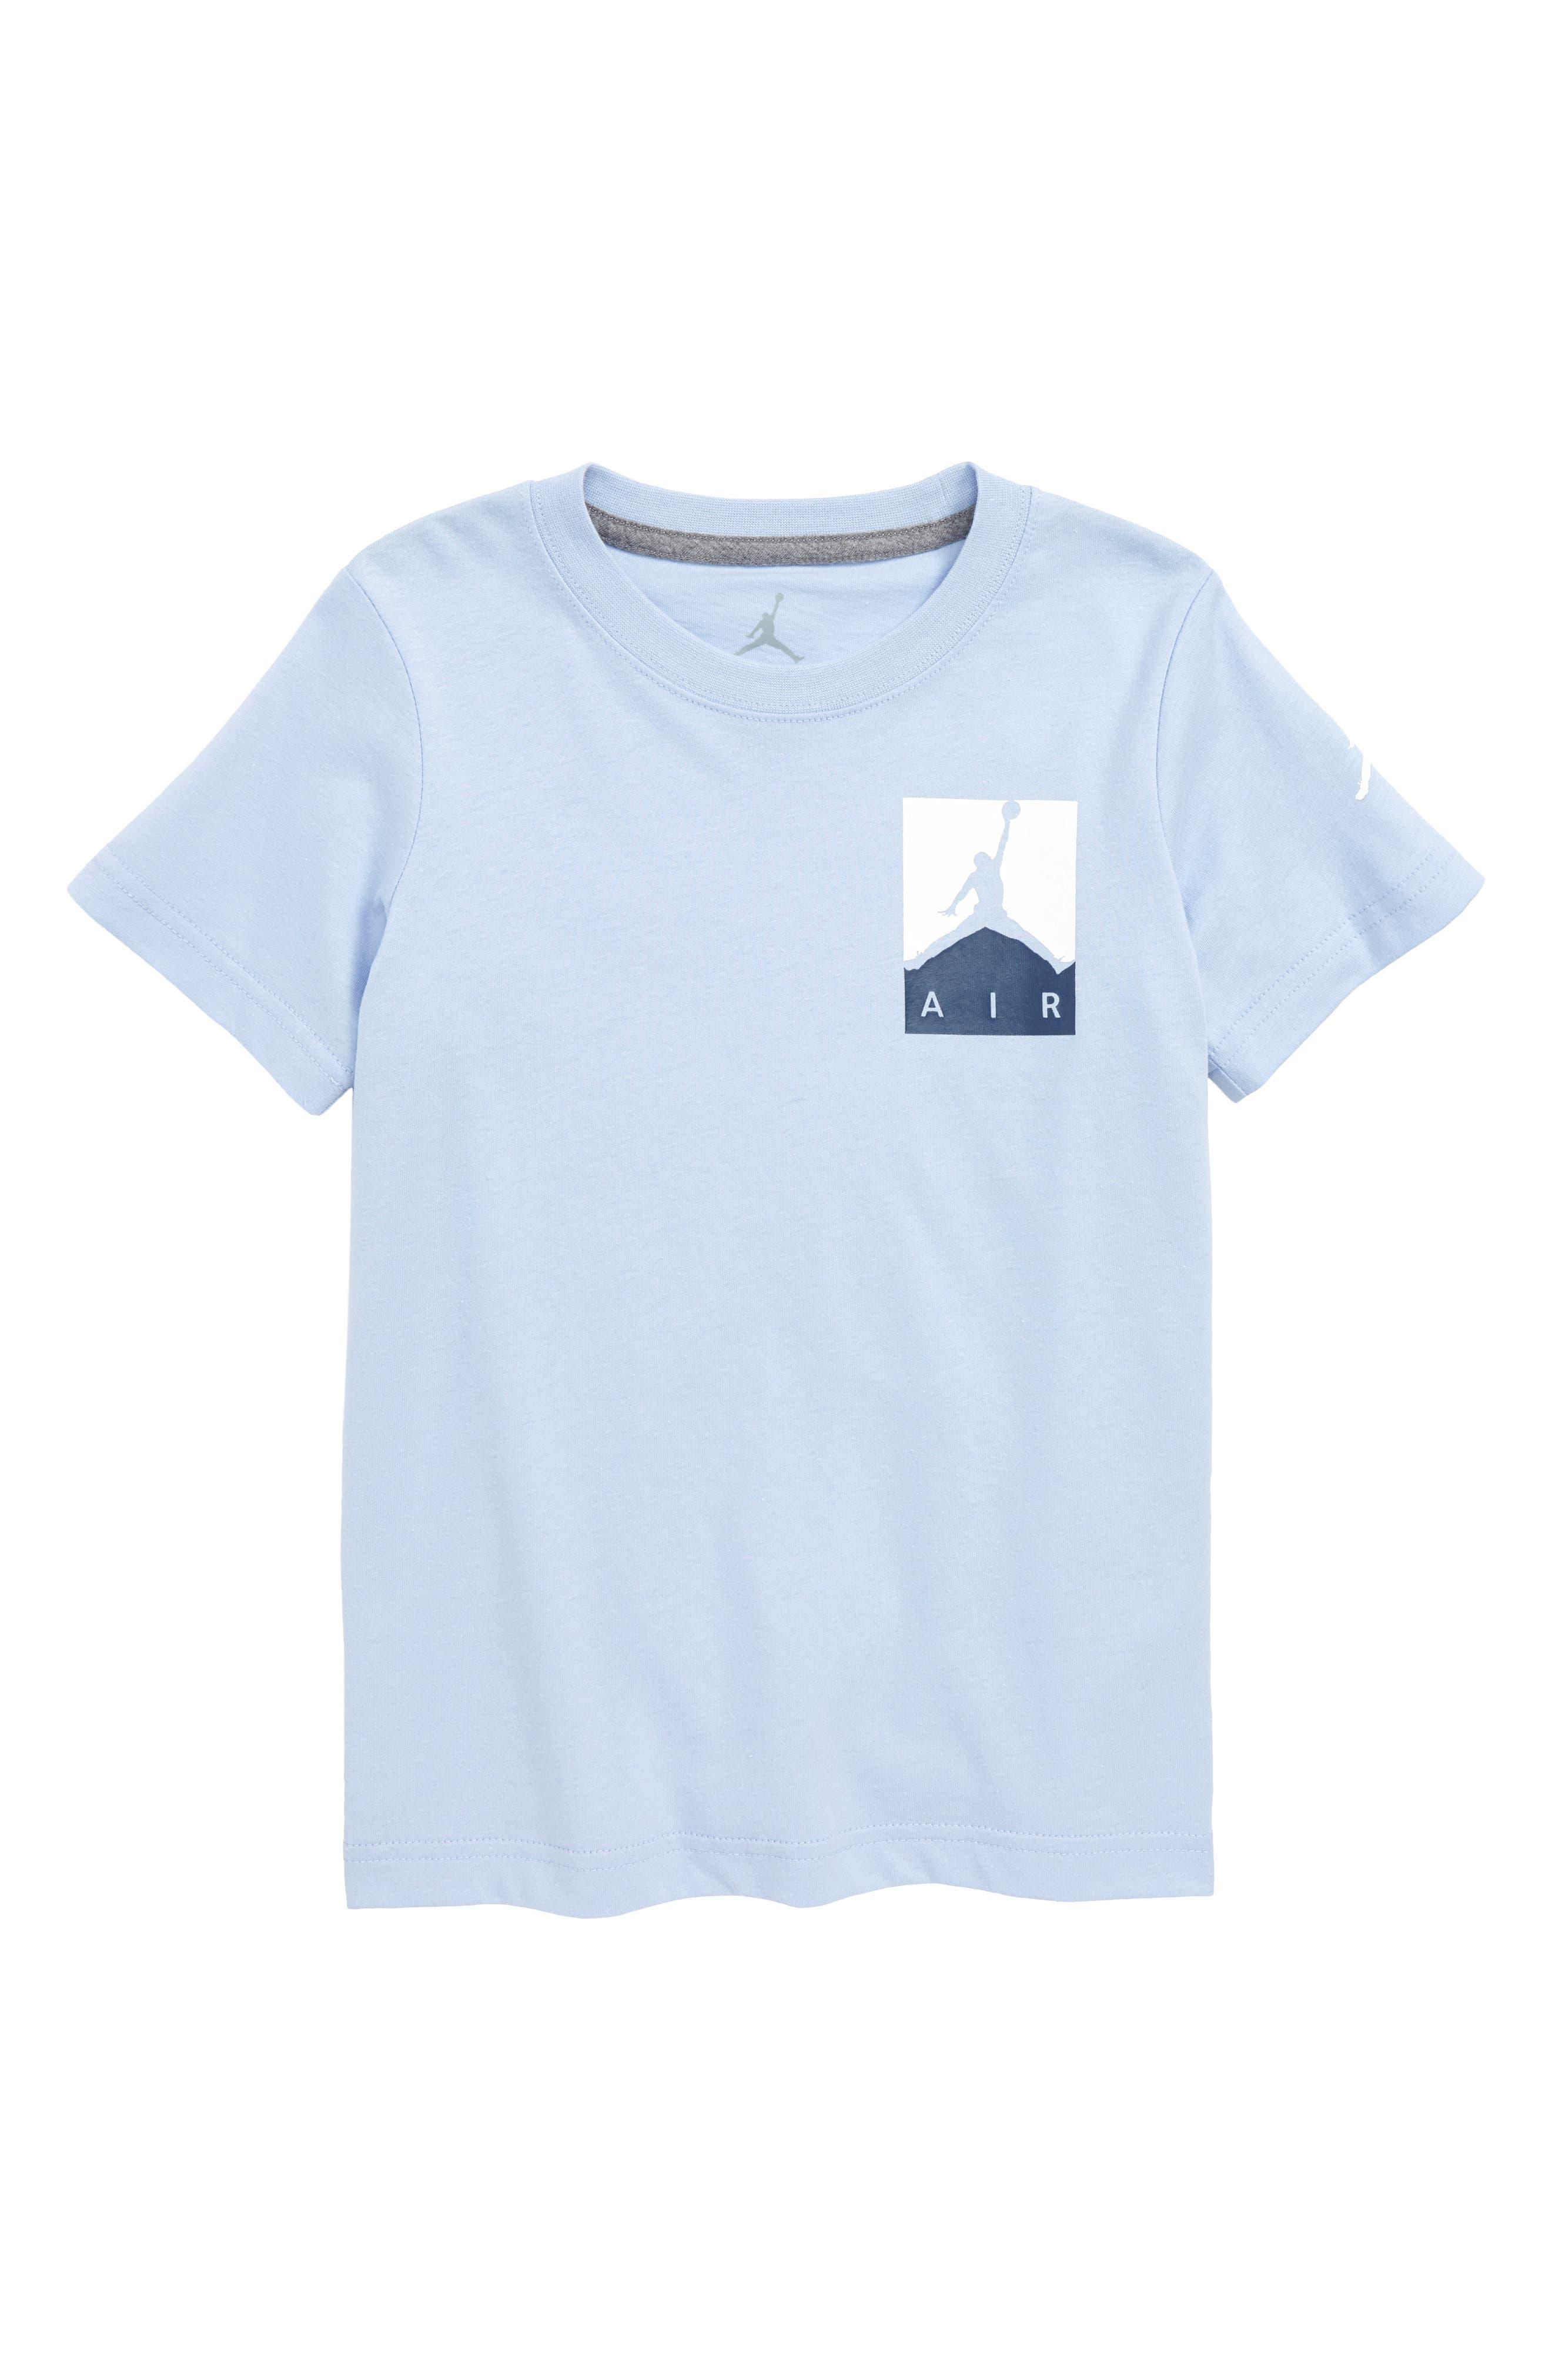 Racked Up Graphic T-Shirt,                             Main thumbnail 1, color,                             451